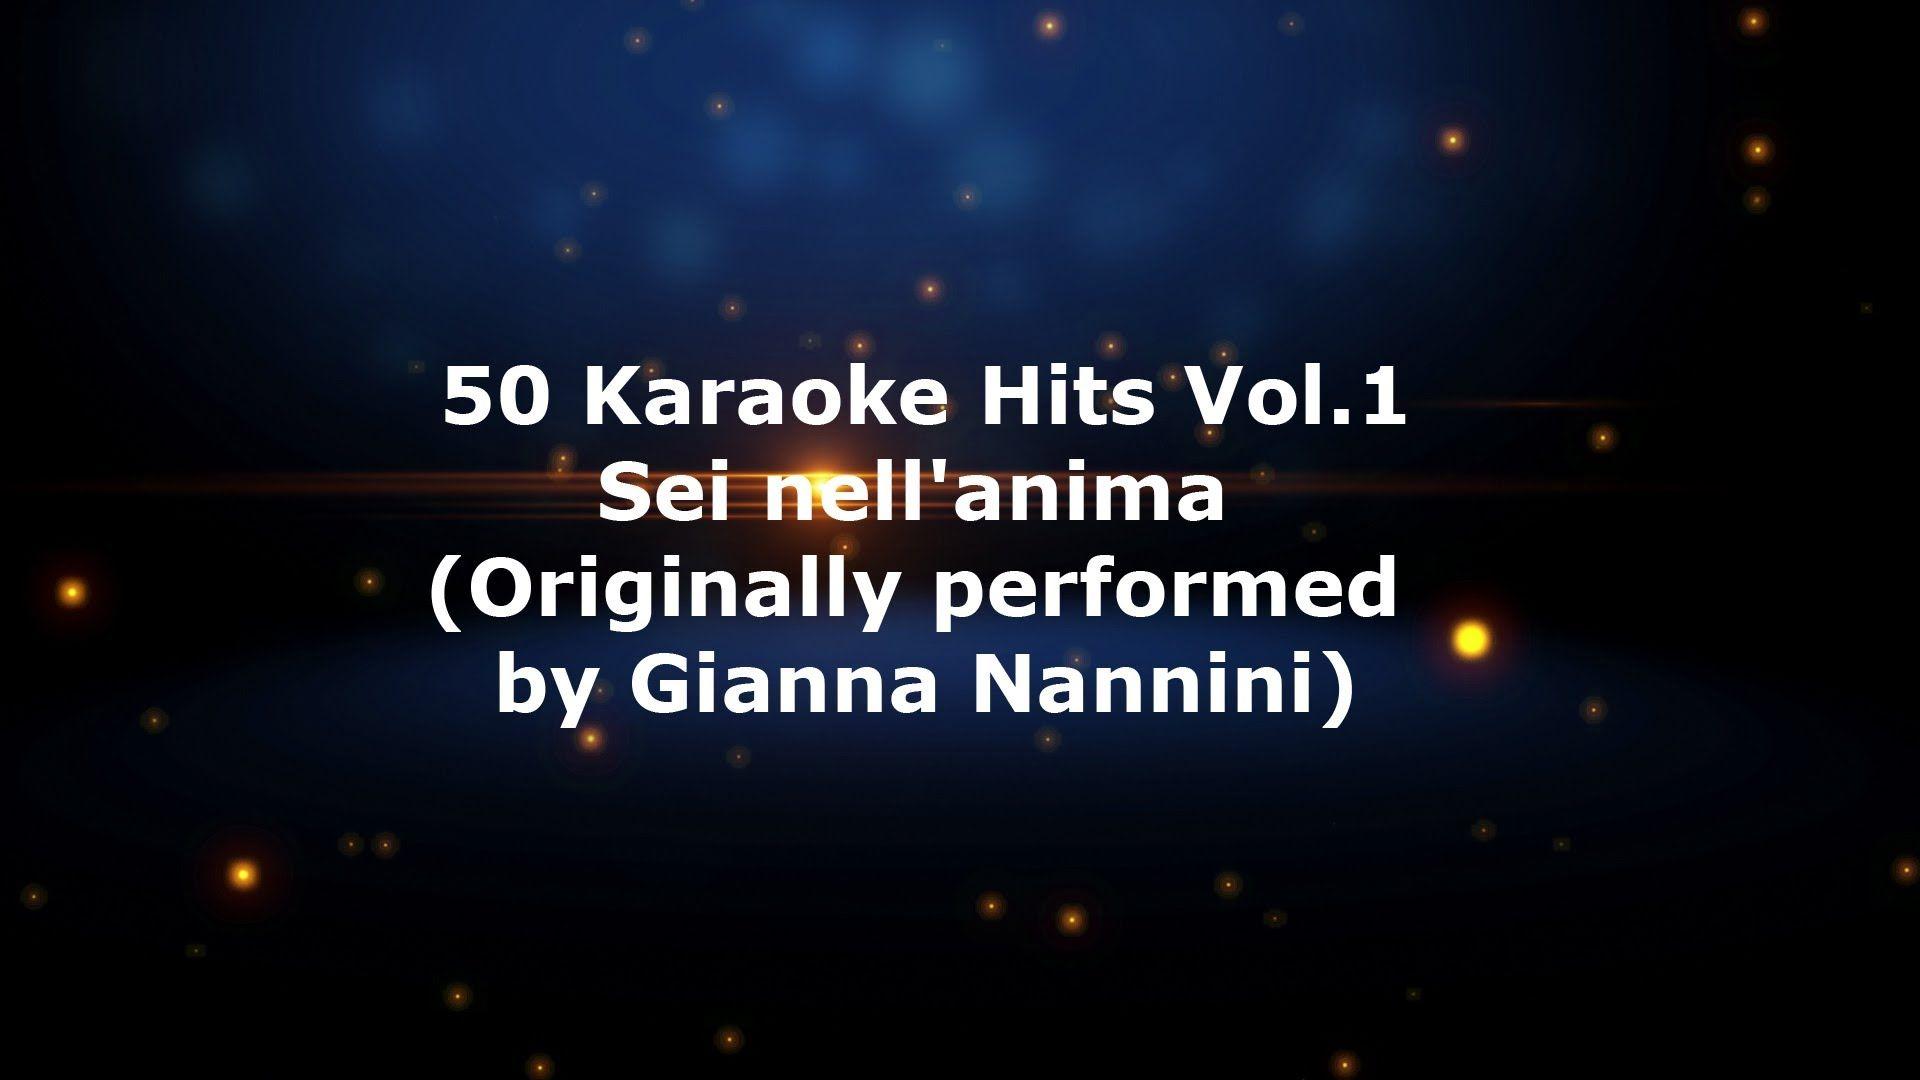 50 Karaoke Hits Vol 1 Sei nell'anima Originally performed by Gianna Nannini